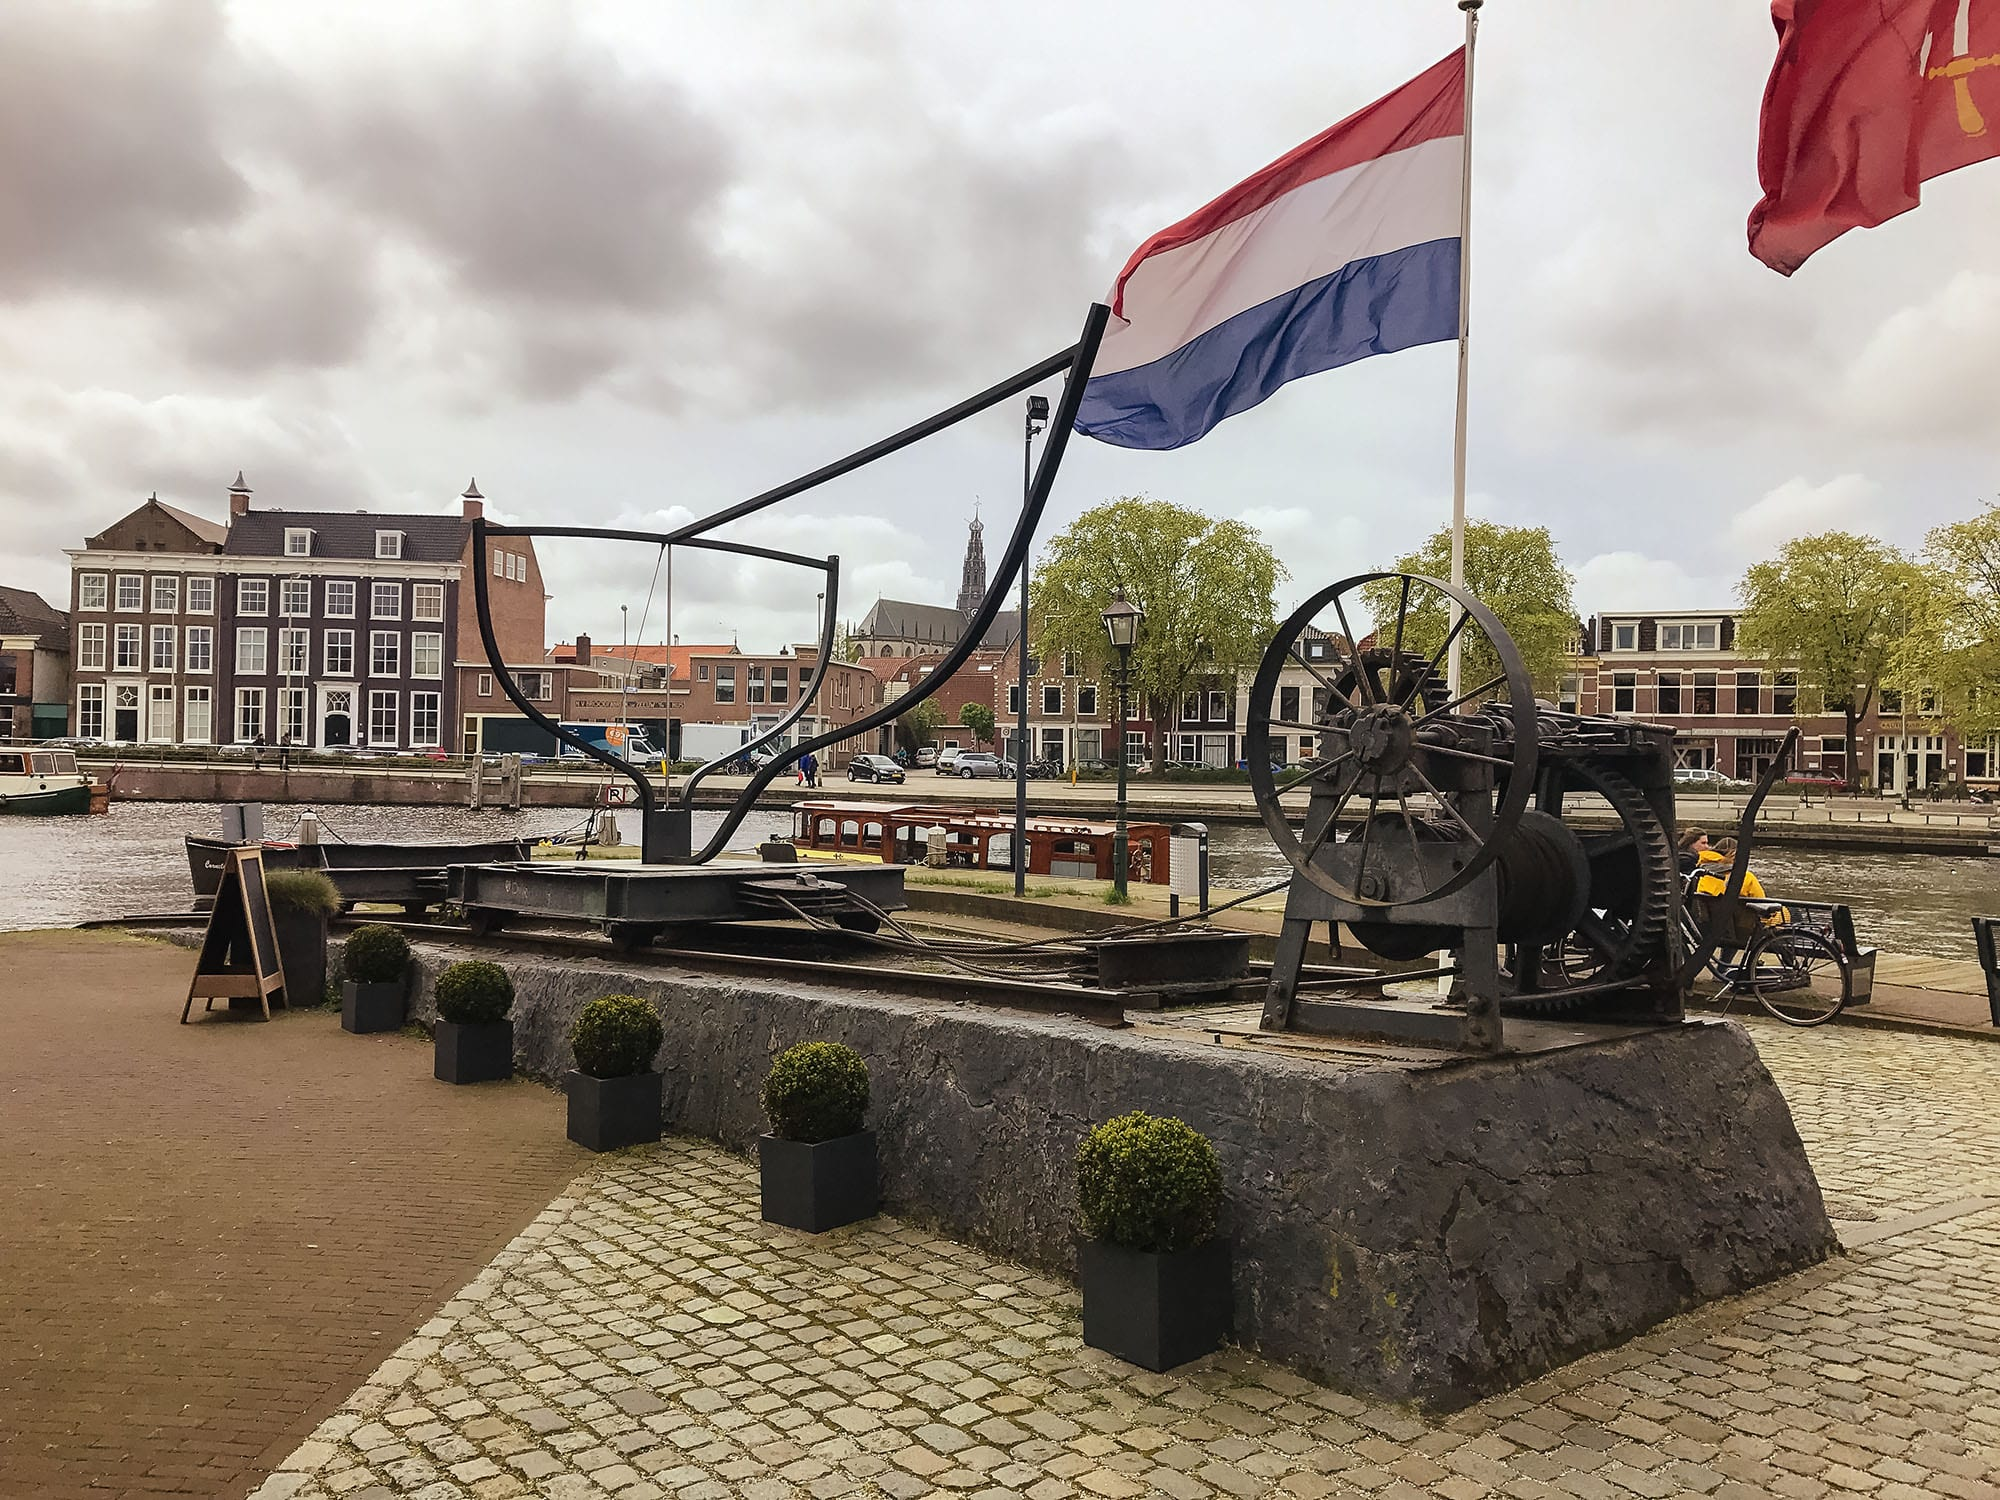 artist's representation of the shipyard outside de Adriaan Windmill